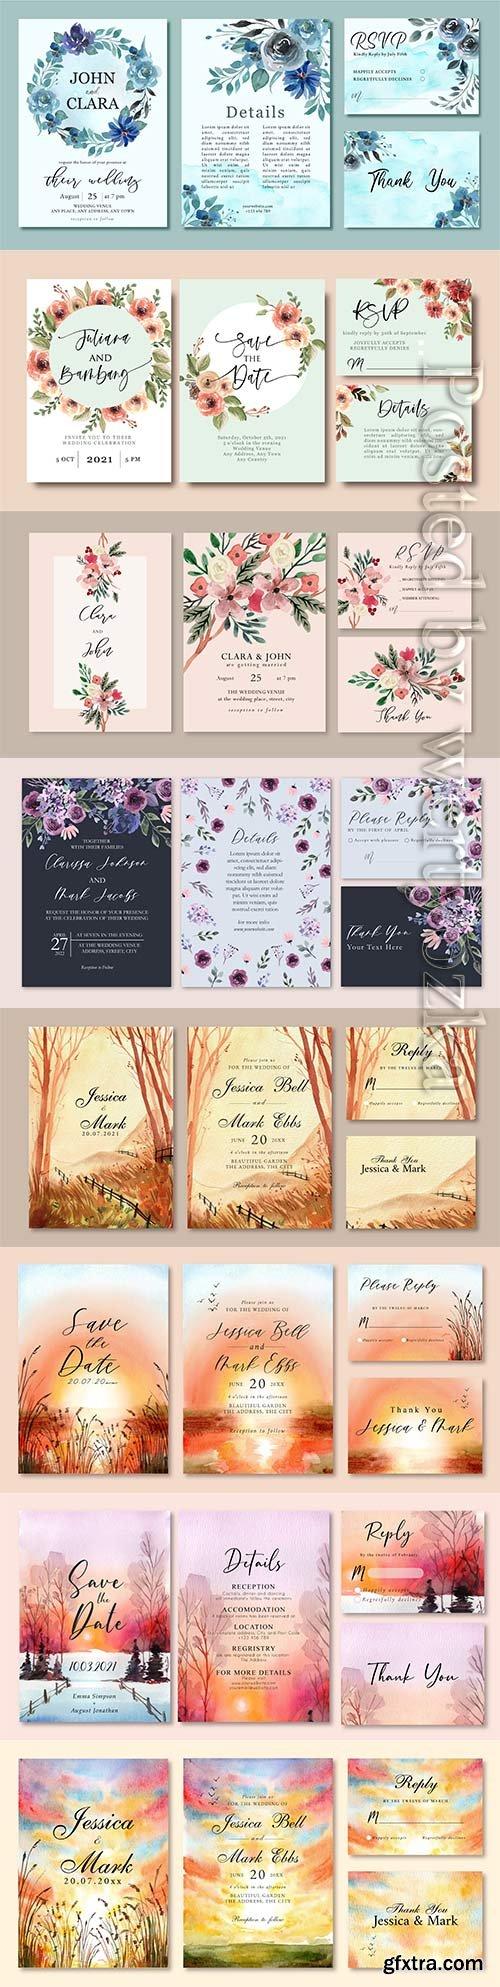 Wedding invitation card design with flower